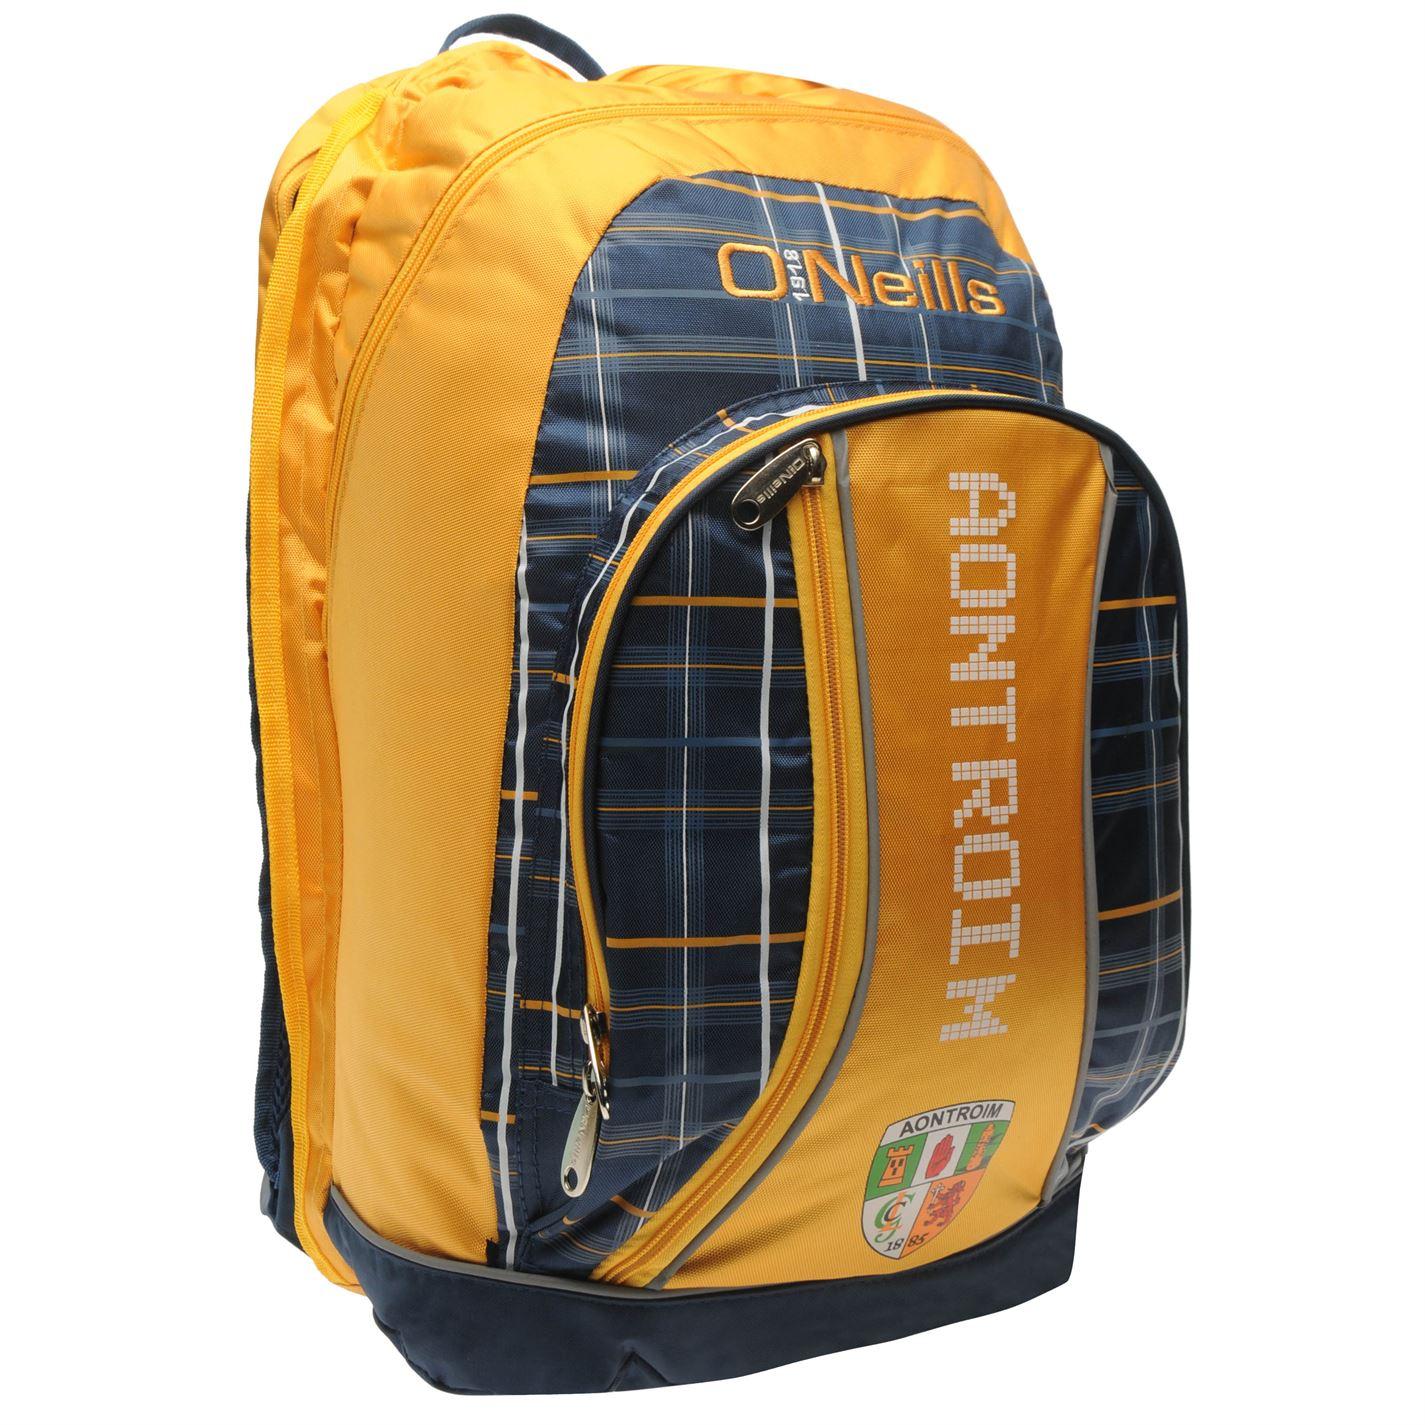 ONeills Antrim GAA Marley Backpack